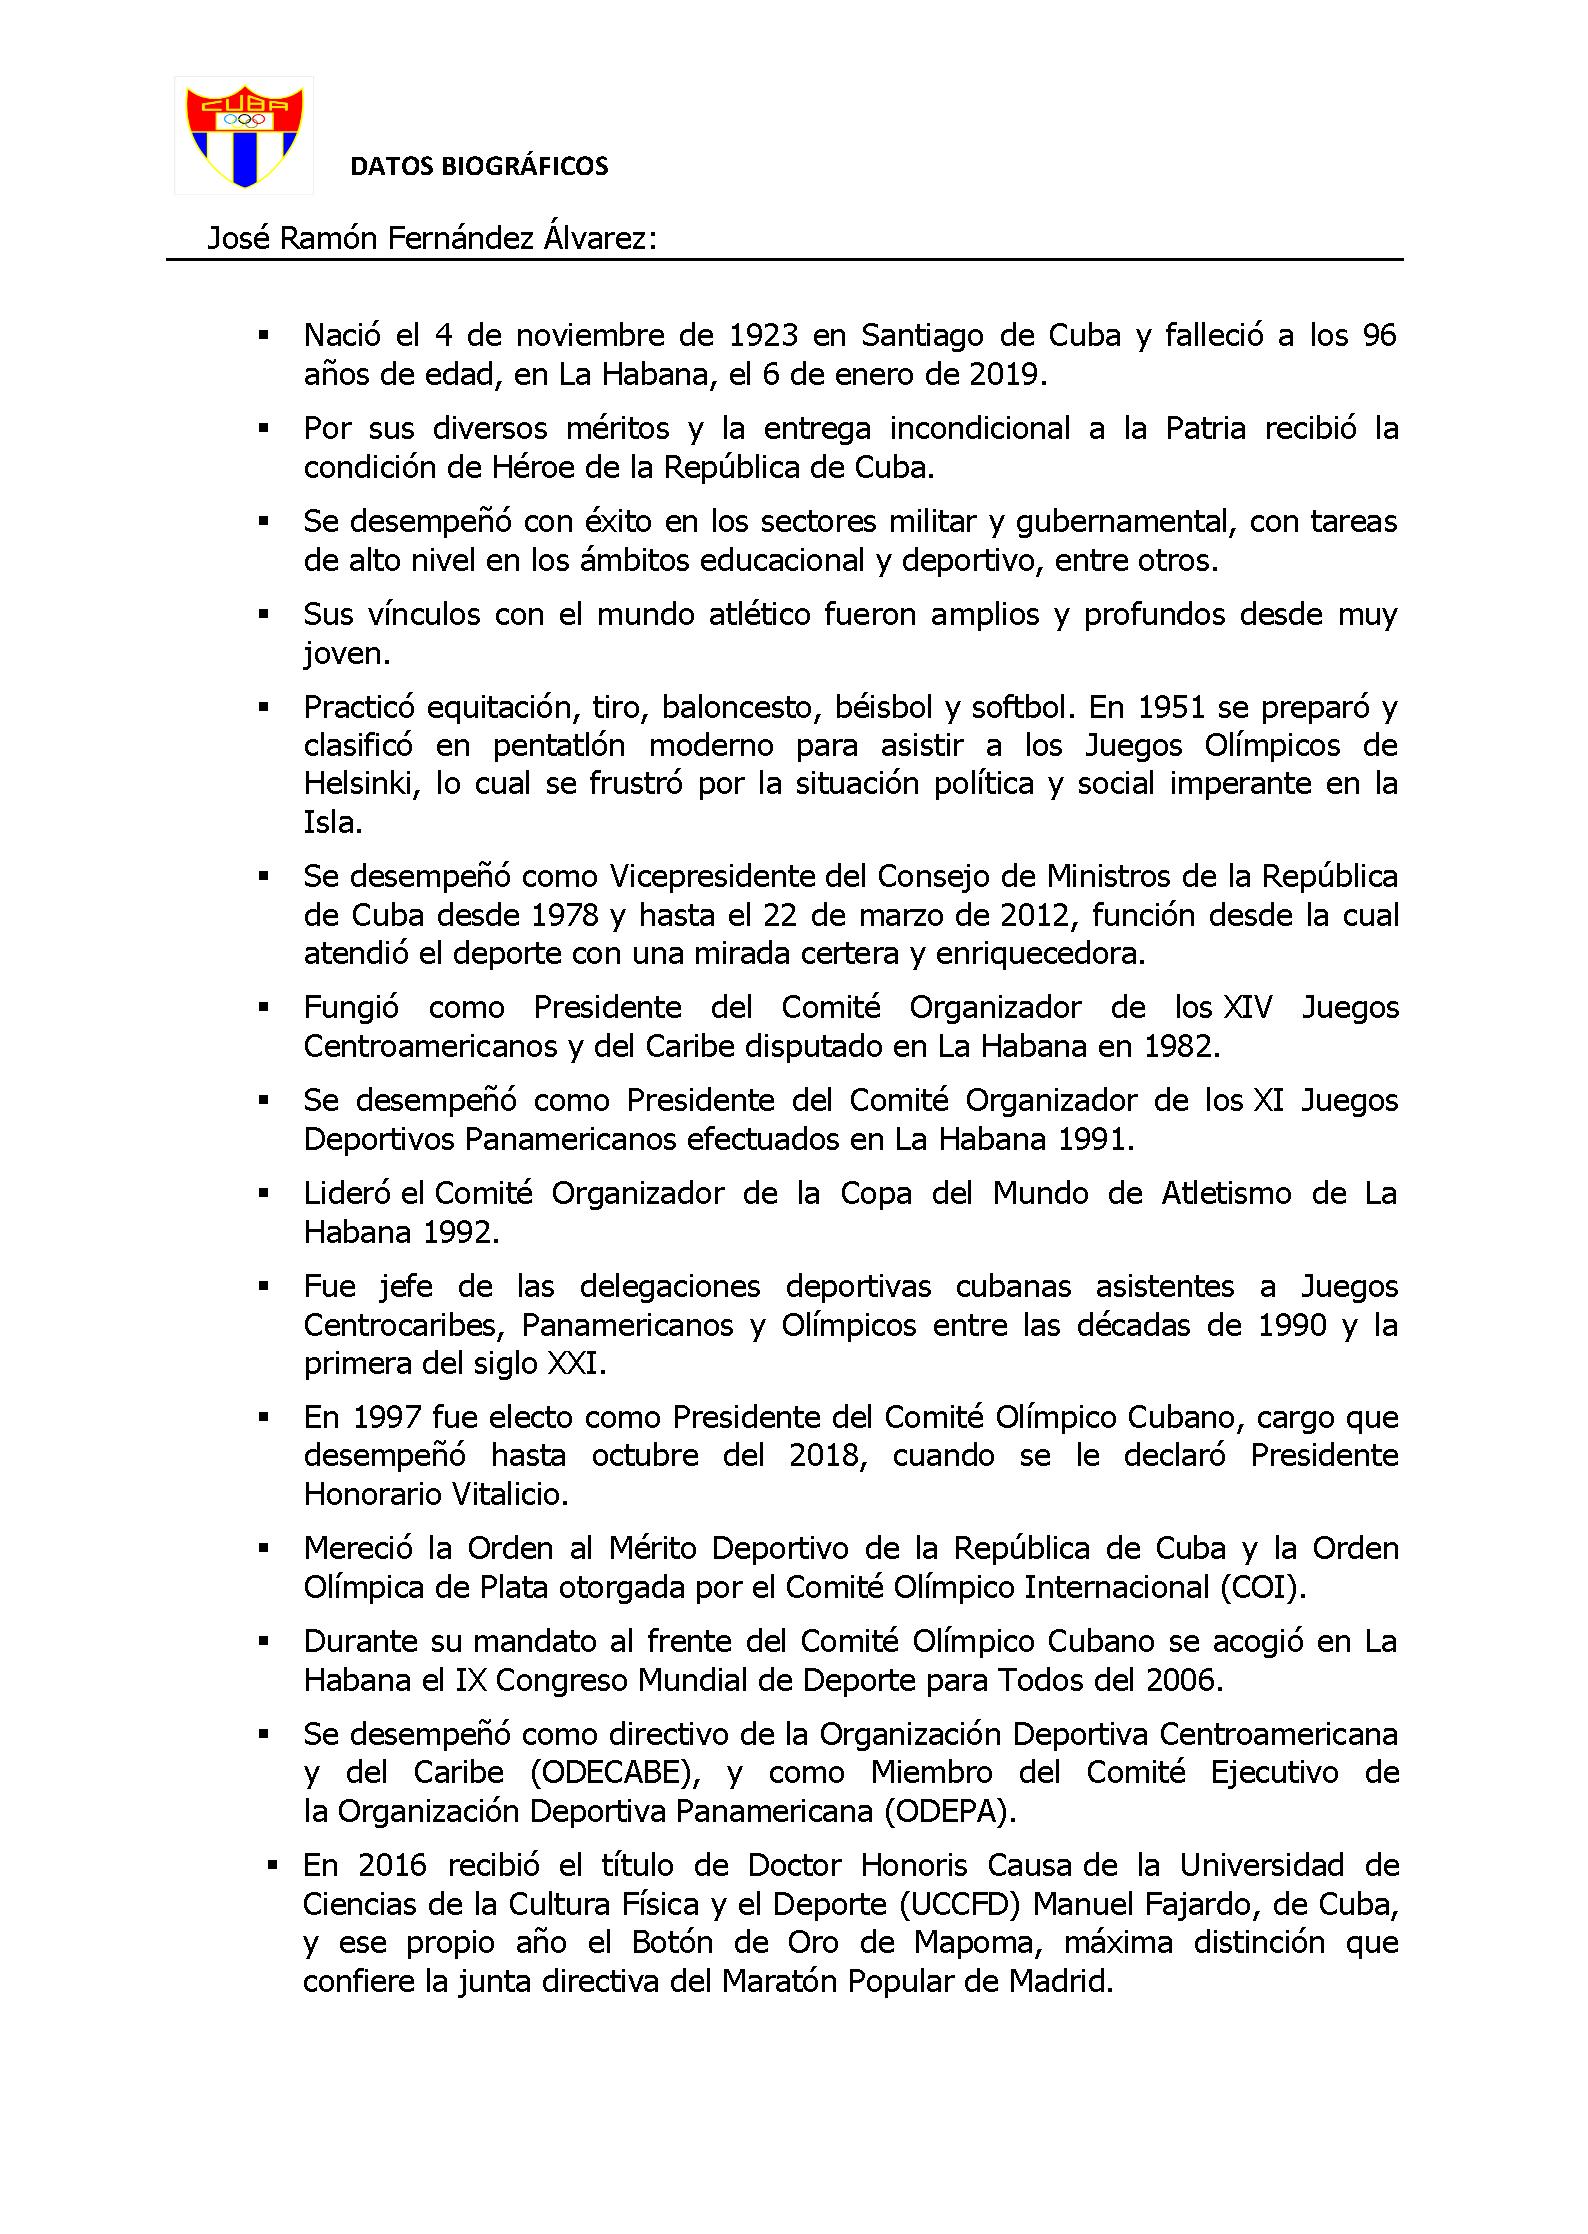 DATOS BIOGRÁFICOS DE JOSÉ RAMÓN FERNÁNDEZ ALVAREZ